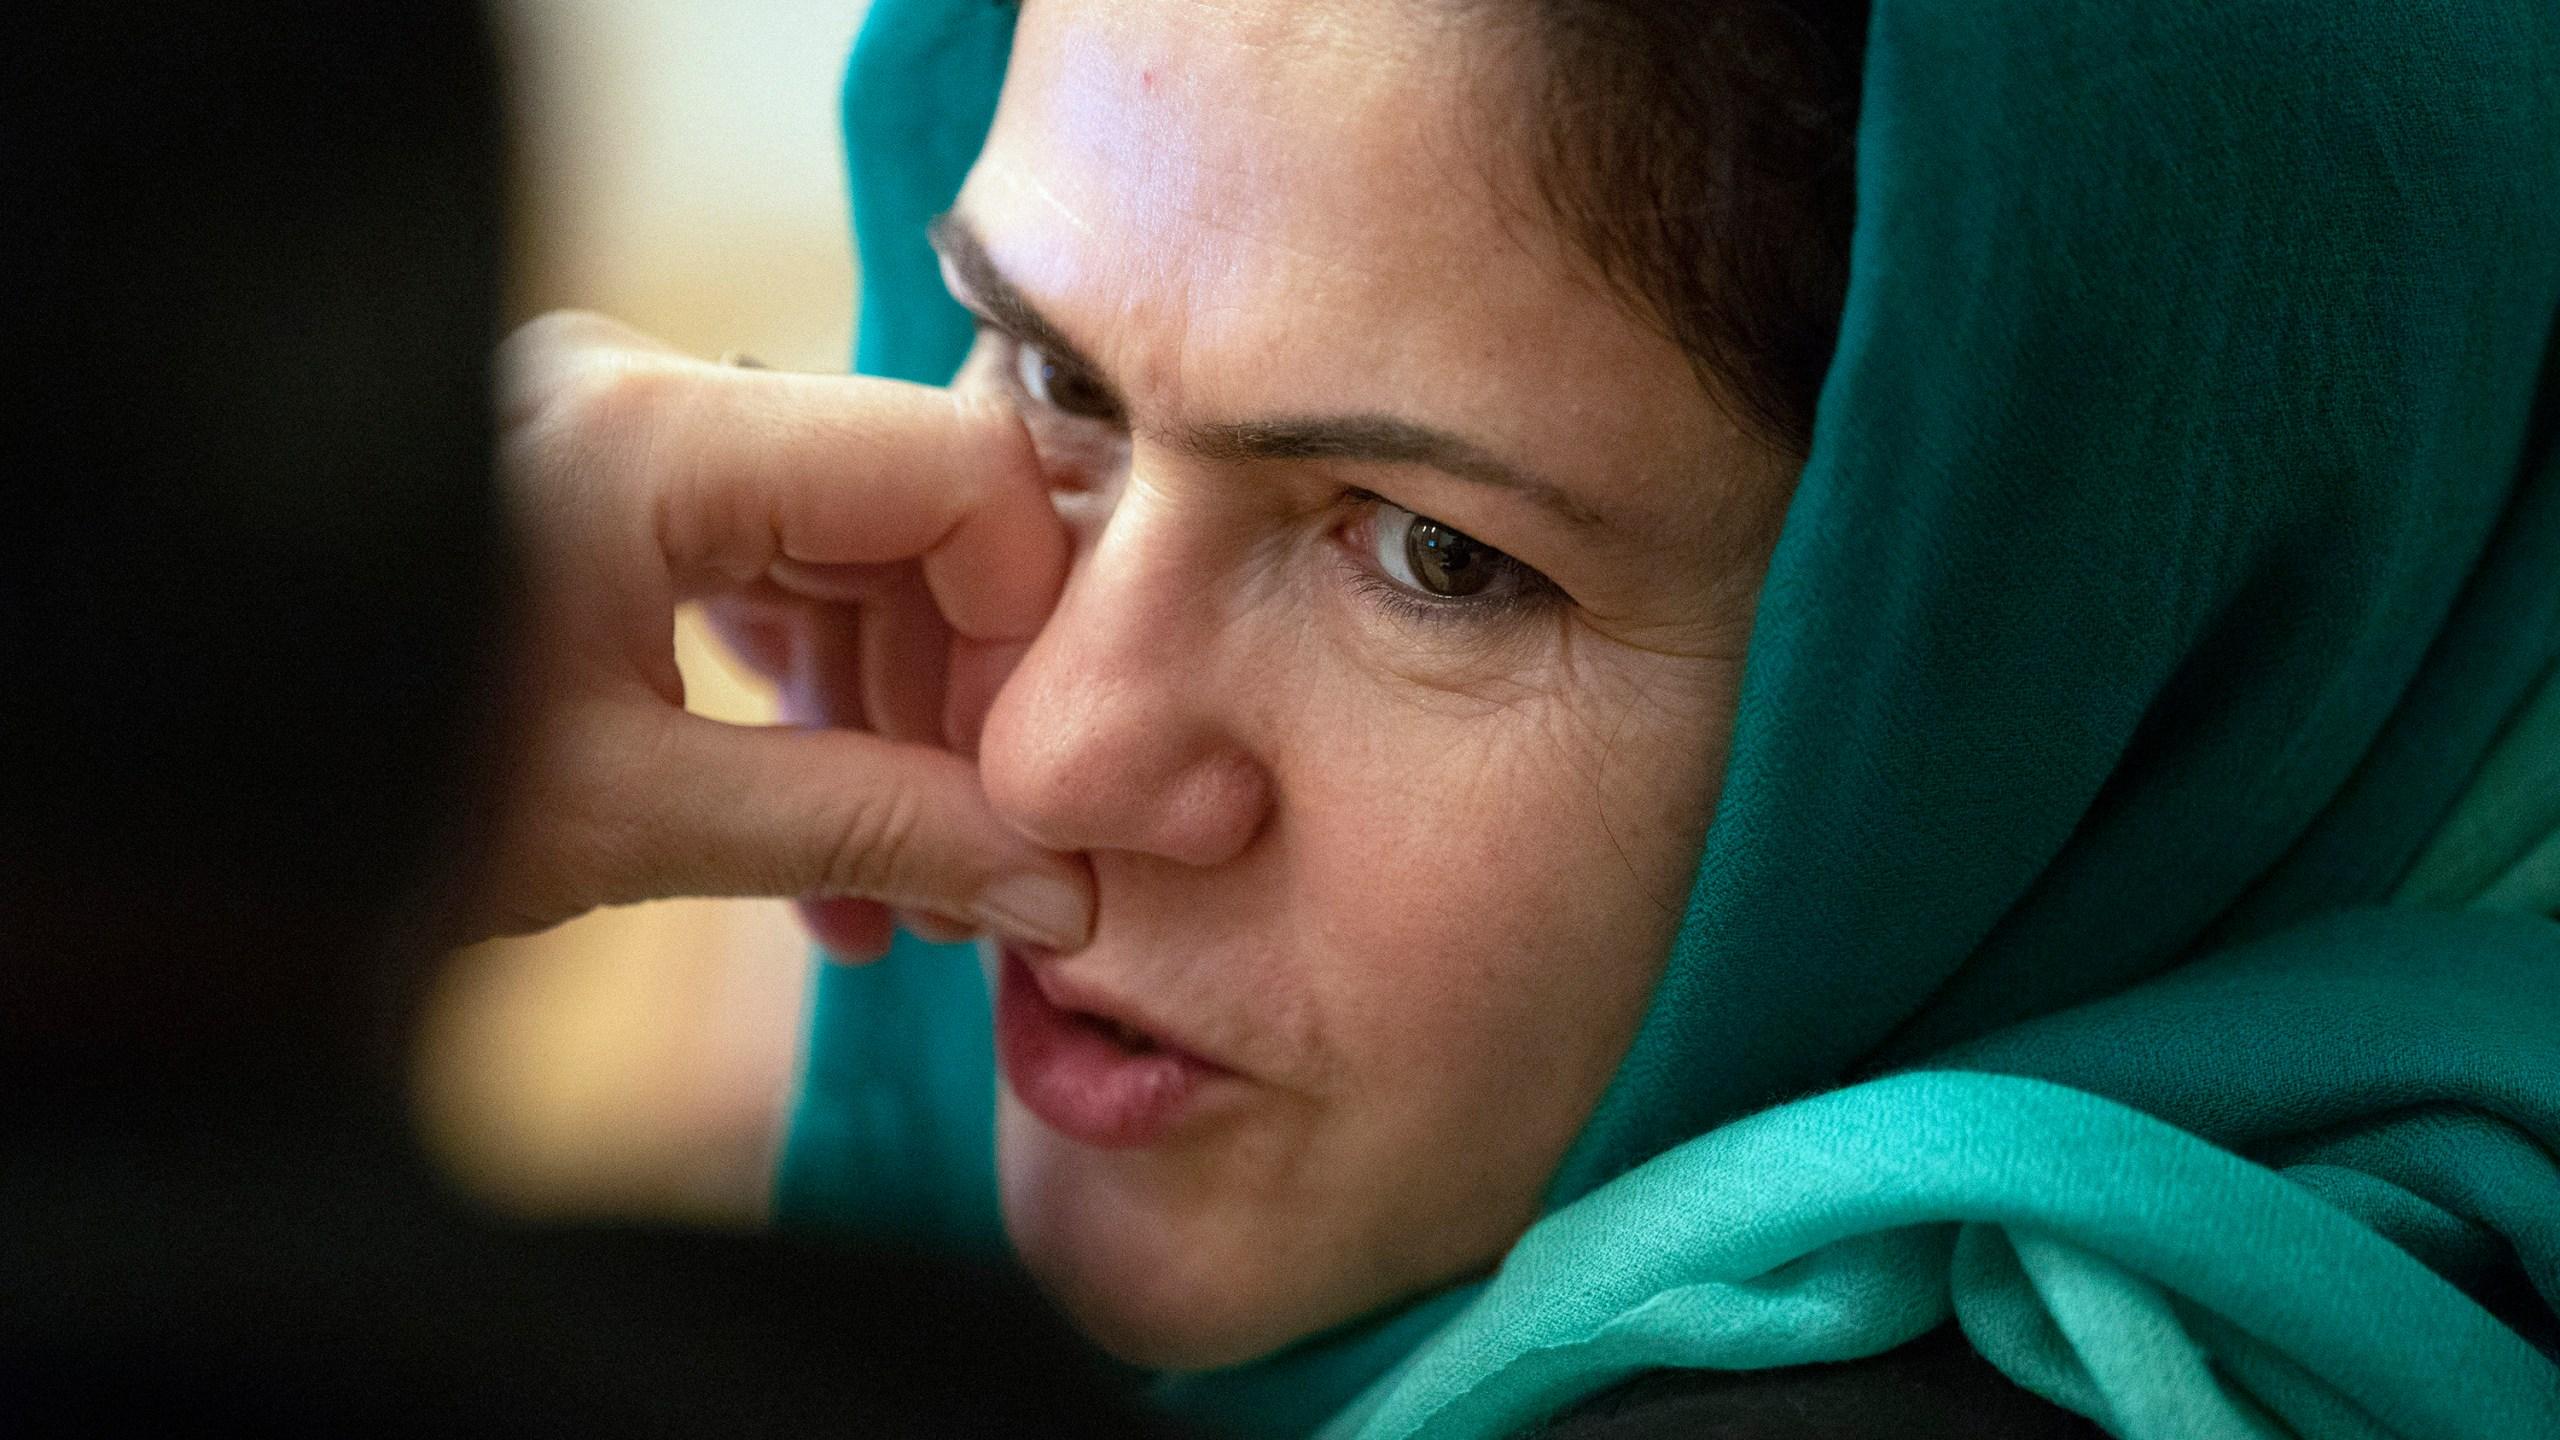 Fawzia Koofi